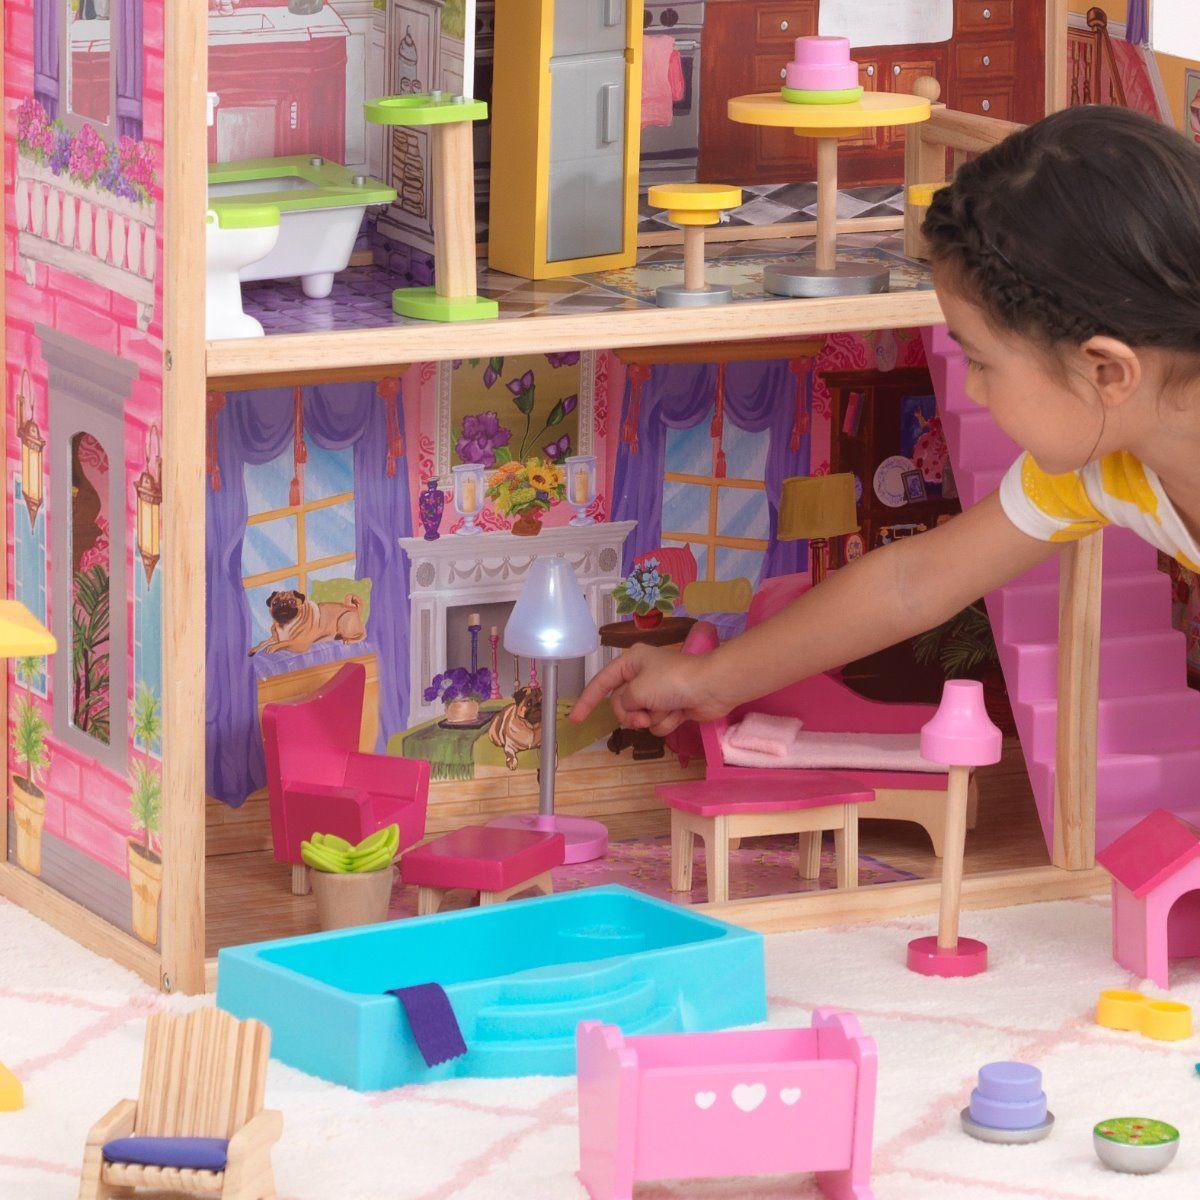 KidKraft къща за кукли Барби с басейн-bellamiestore